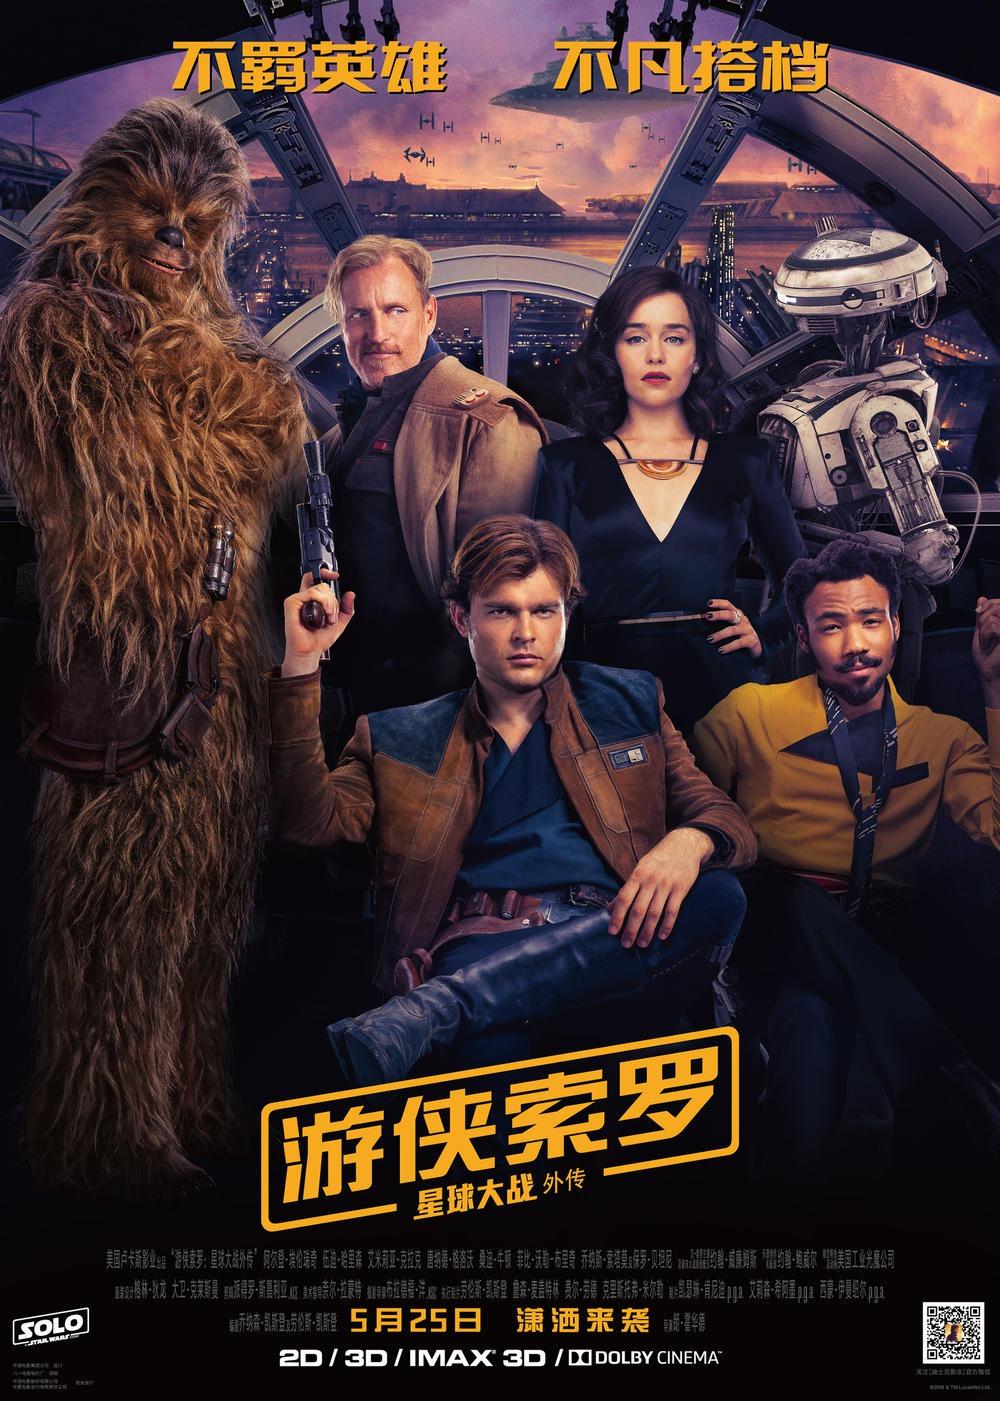 'Han Solo: una historia de Star Wars': Póster con la tropa al completo